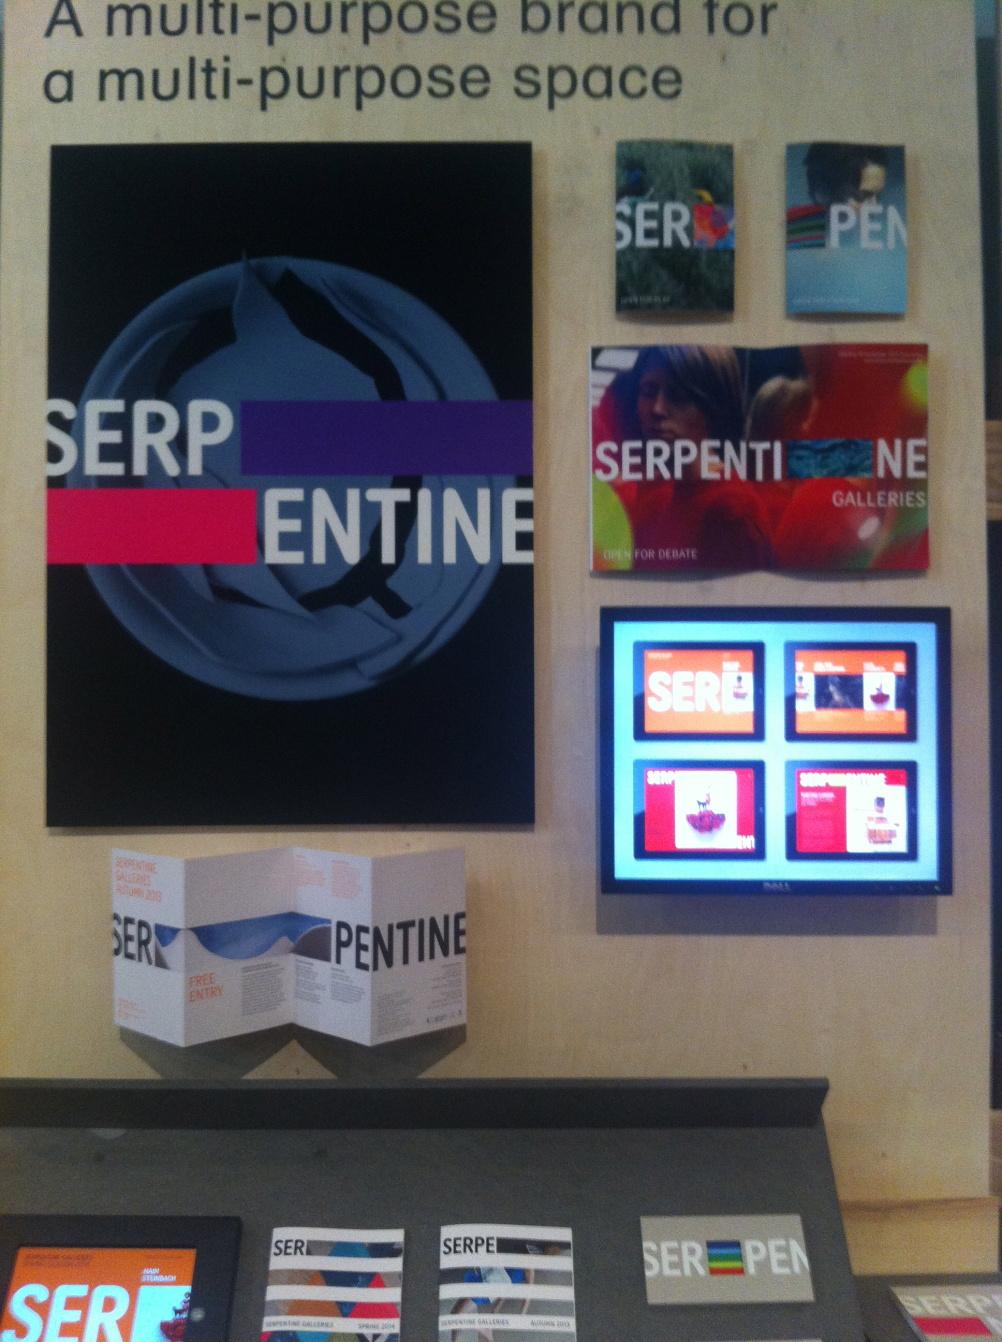 Serpentine identity